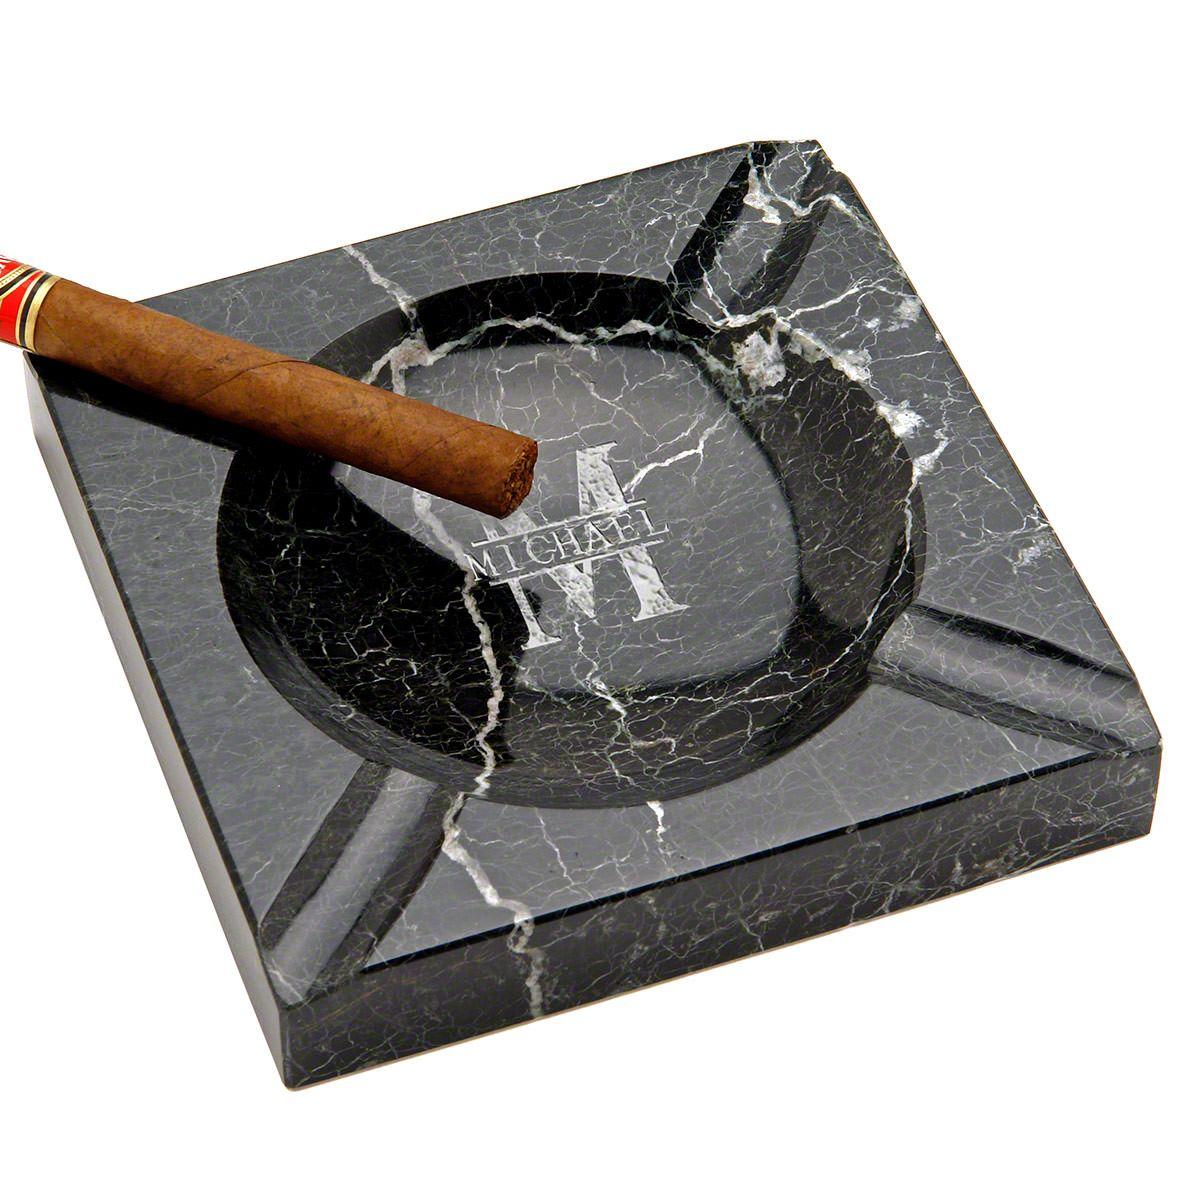 Oakmont Engraved Marble Cigar Ashtray